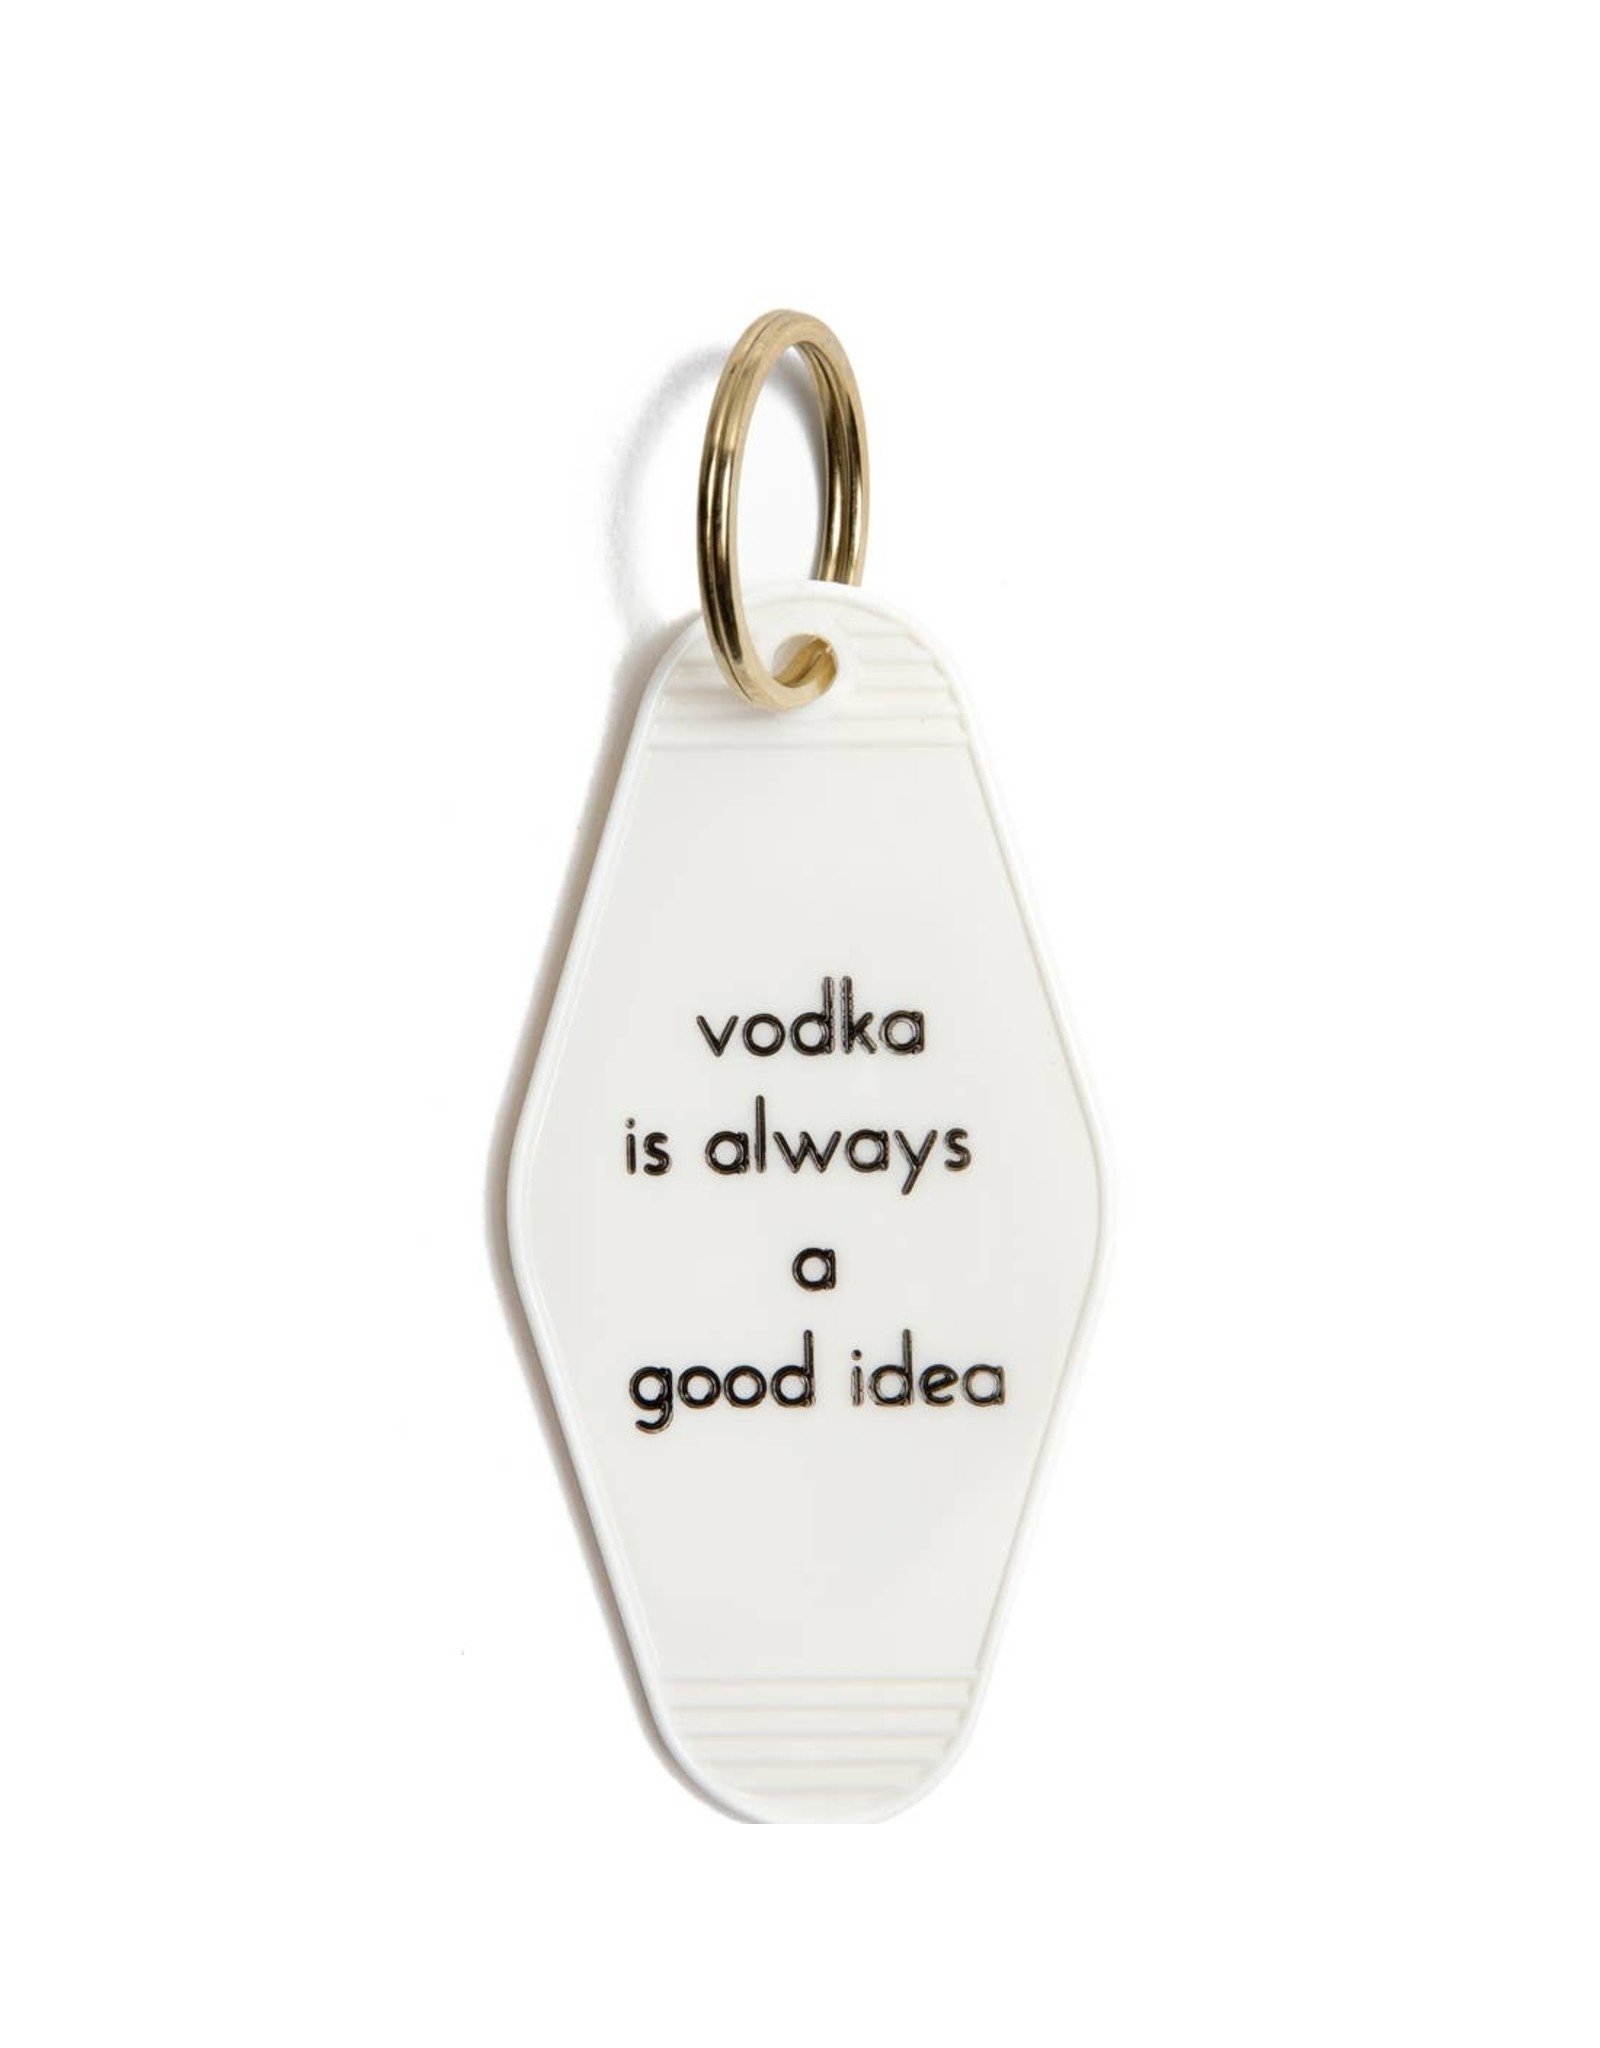 He Said, She Said Keychain - Vodka is always a good idea